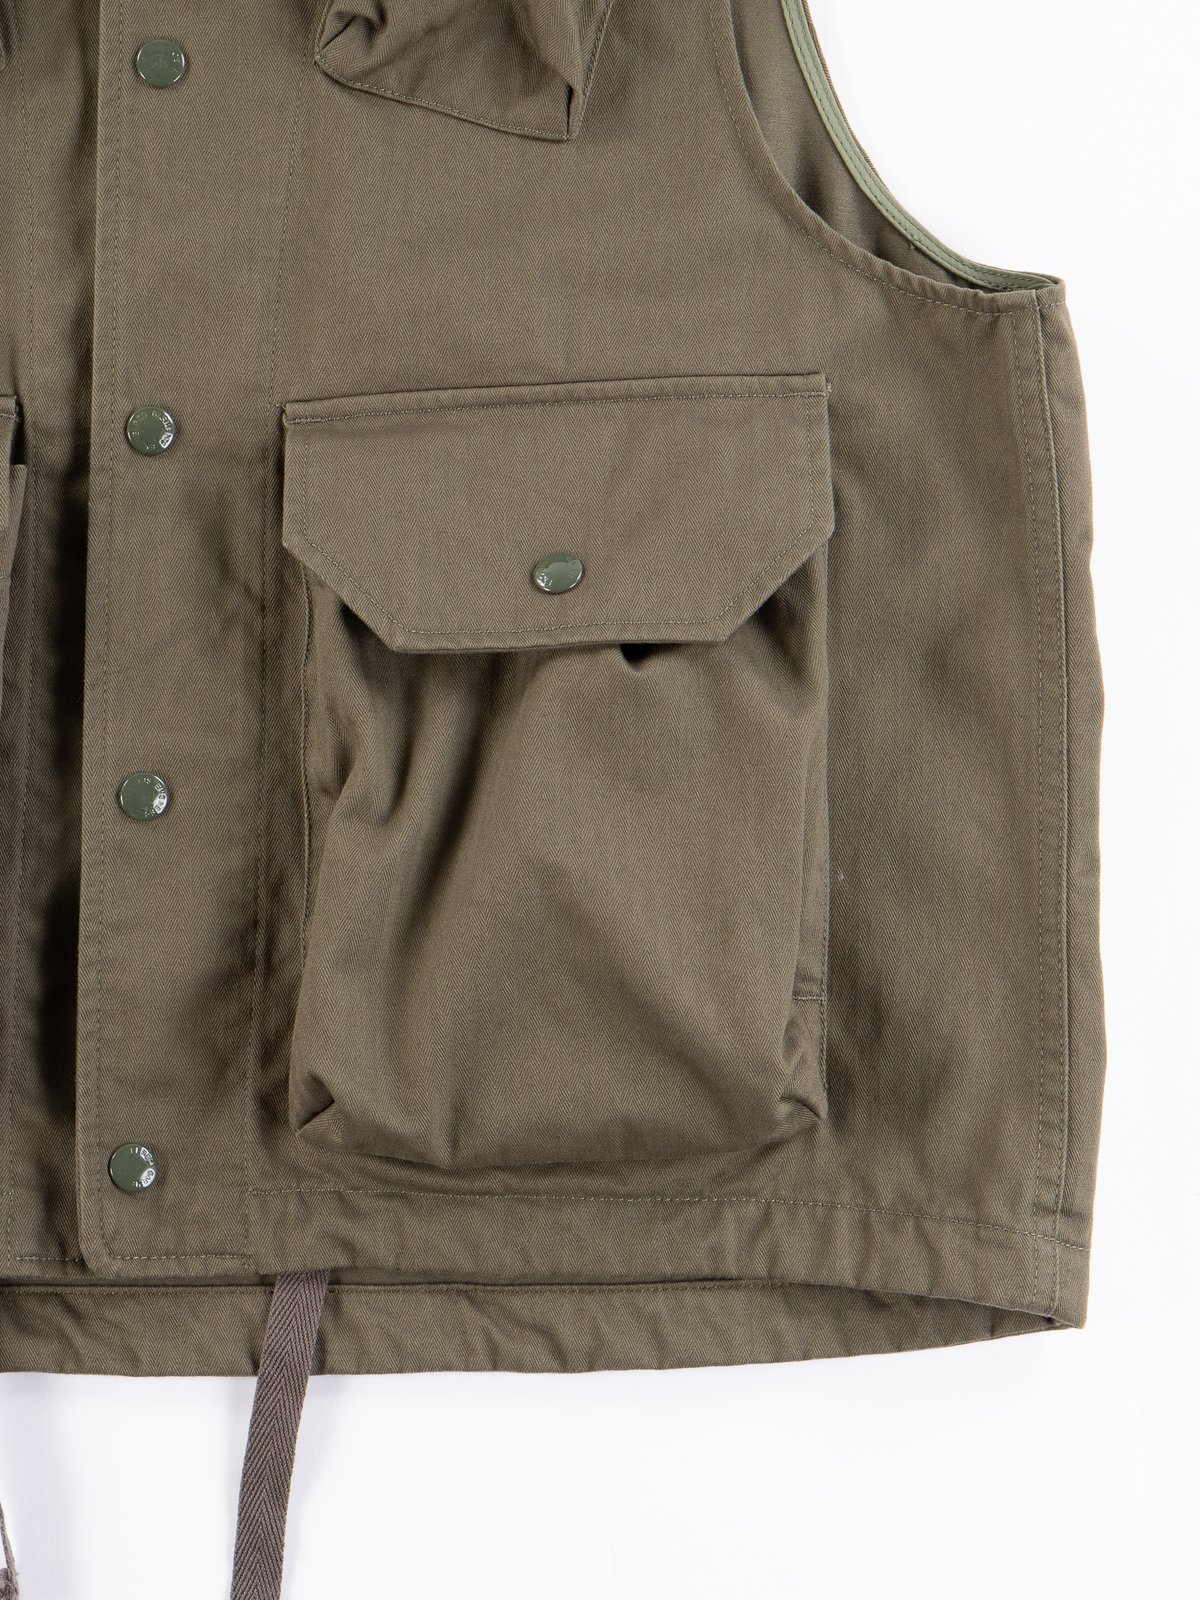 Olive Cotton Herringbone Twill Field Vest - Image 4